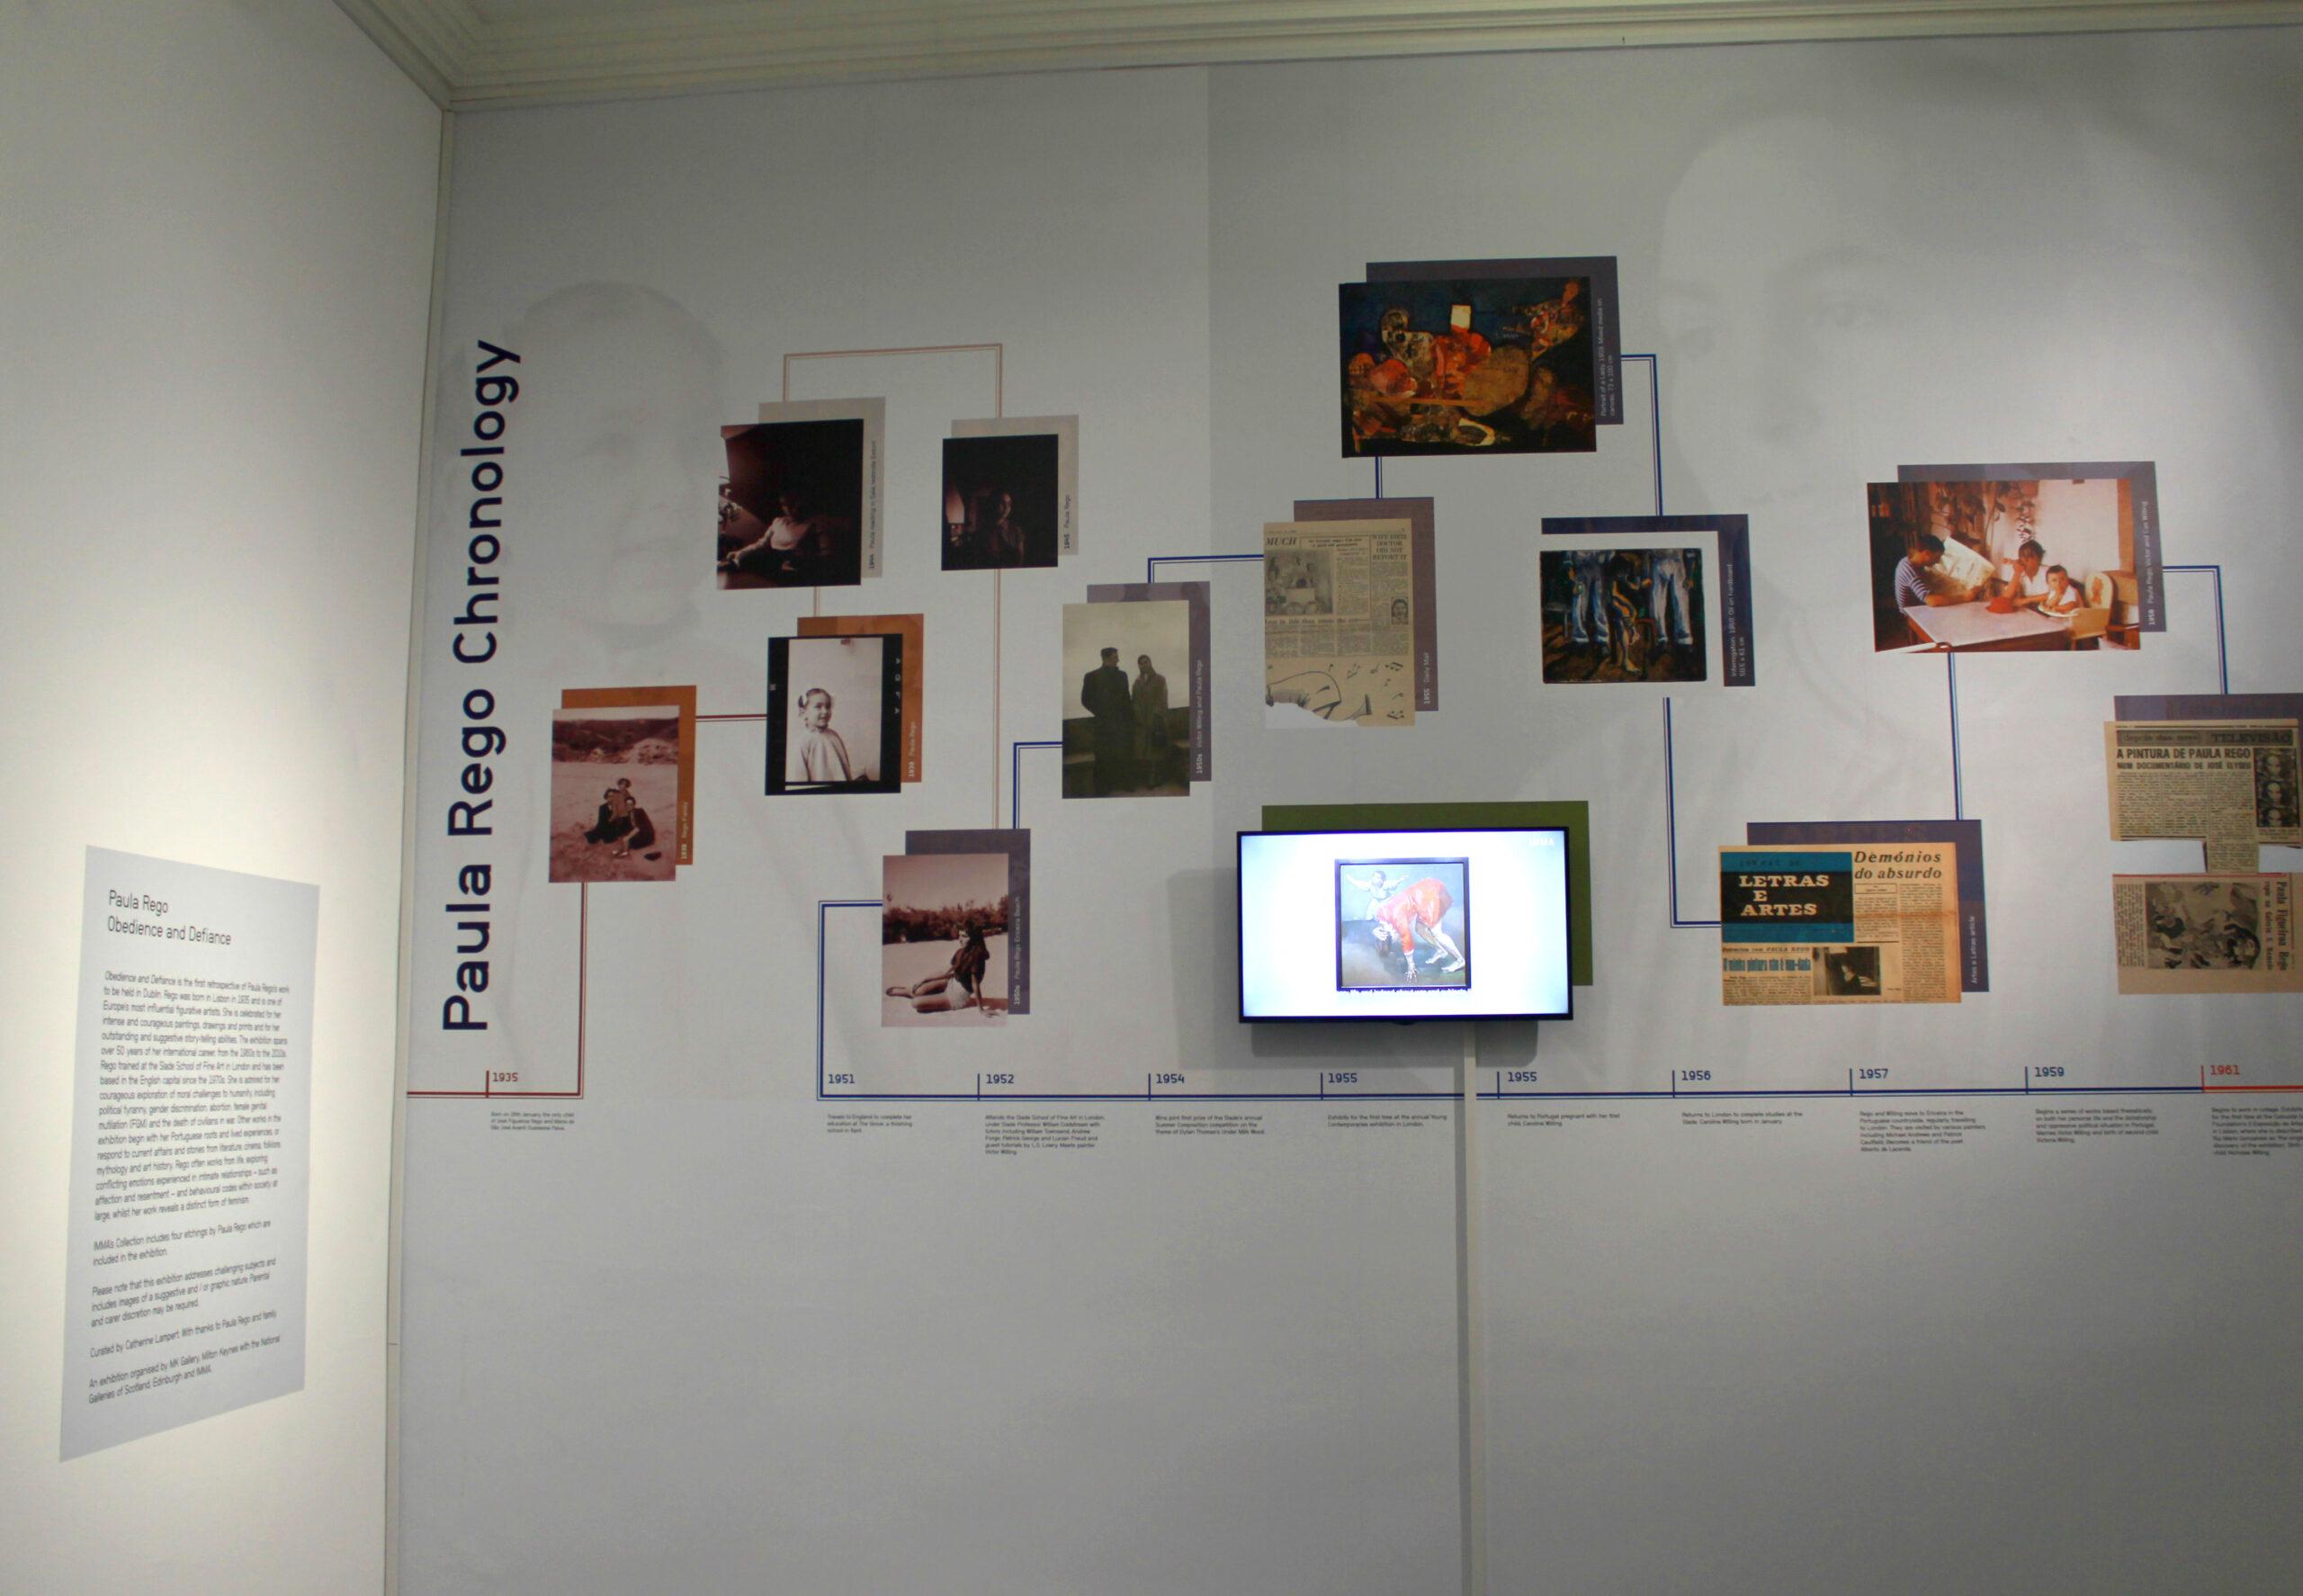 IMMA Paula Rego Timeline Design